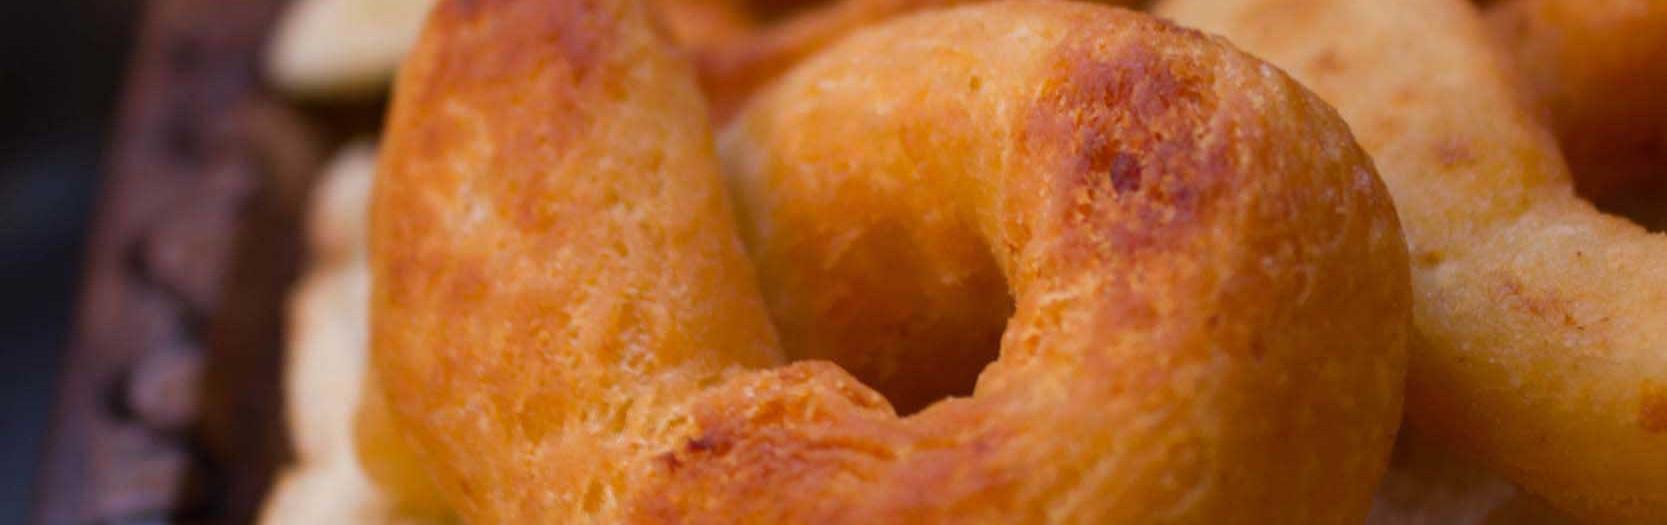 Anelli di patata e fisciu: i Gathulis